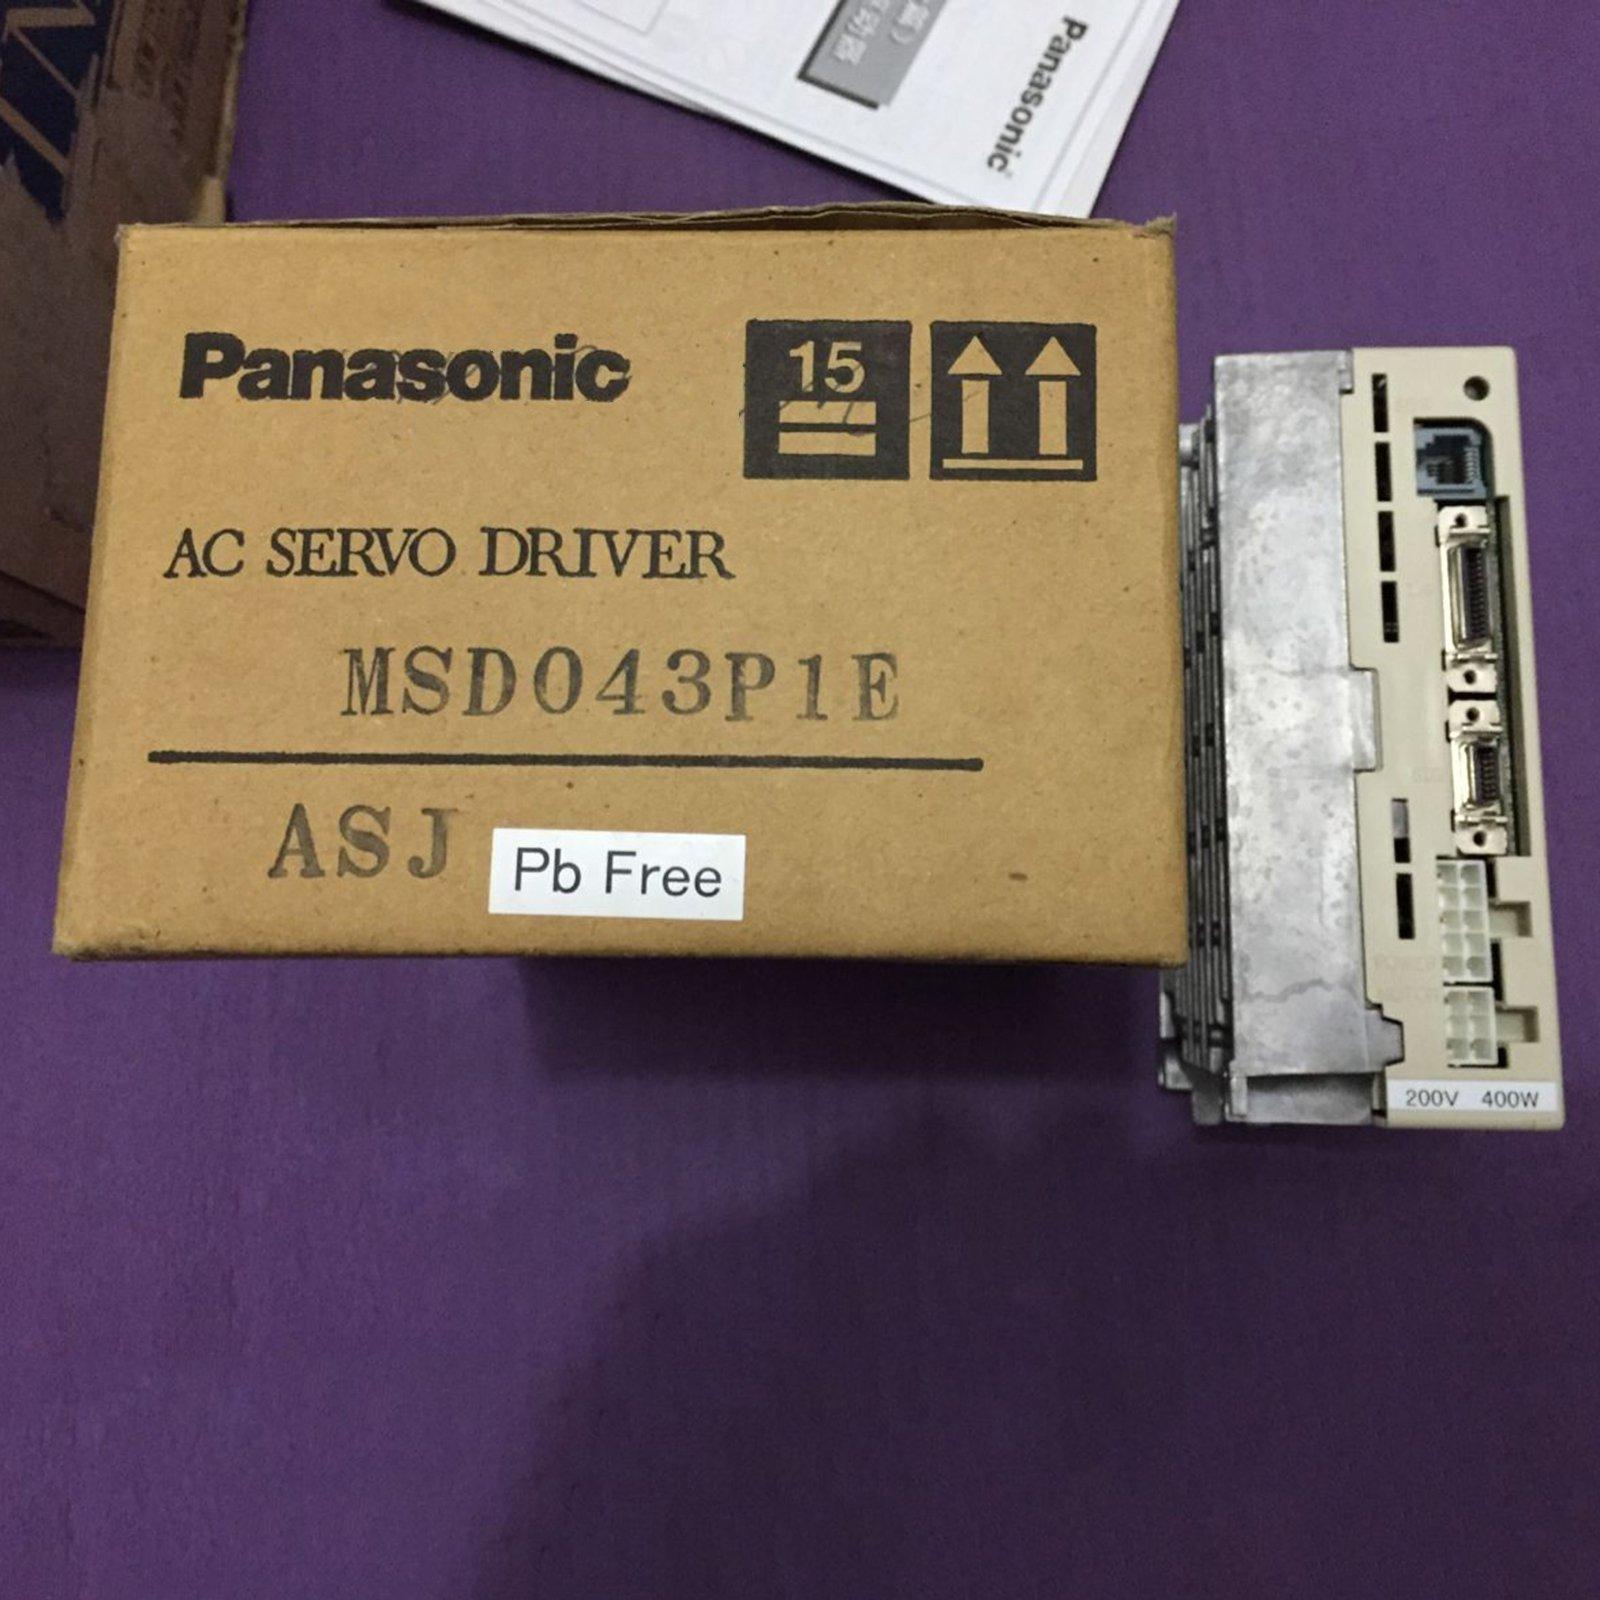 Panasonic Uesd MSD011A1XX05 Servo Drive MSD011A1XX05 90 day warranty